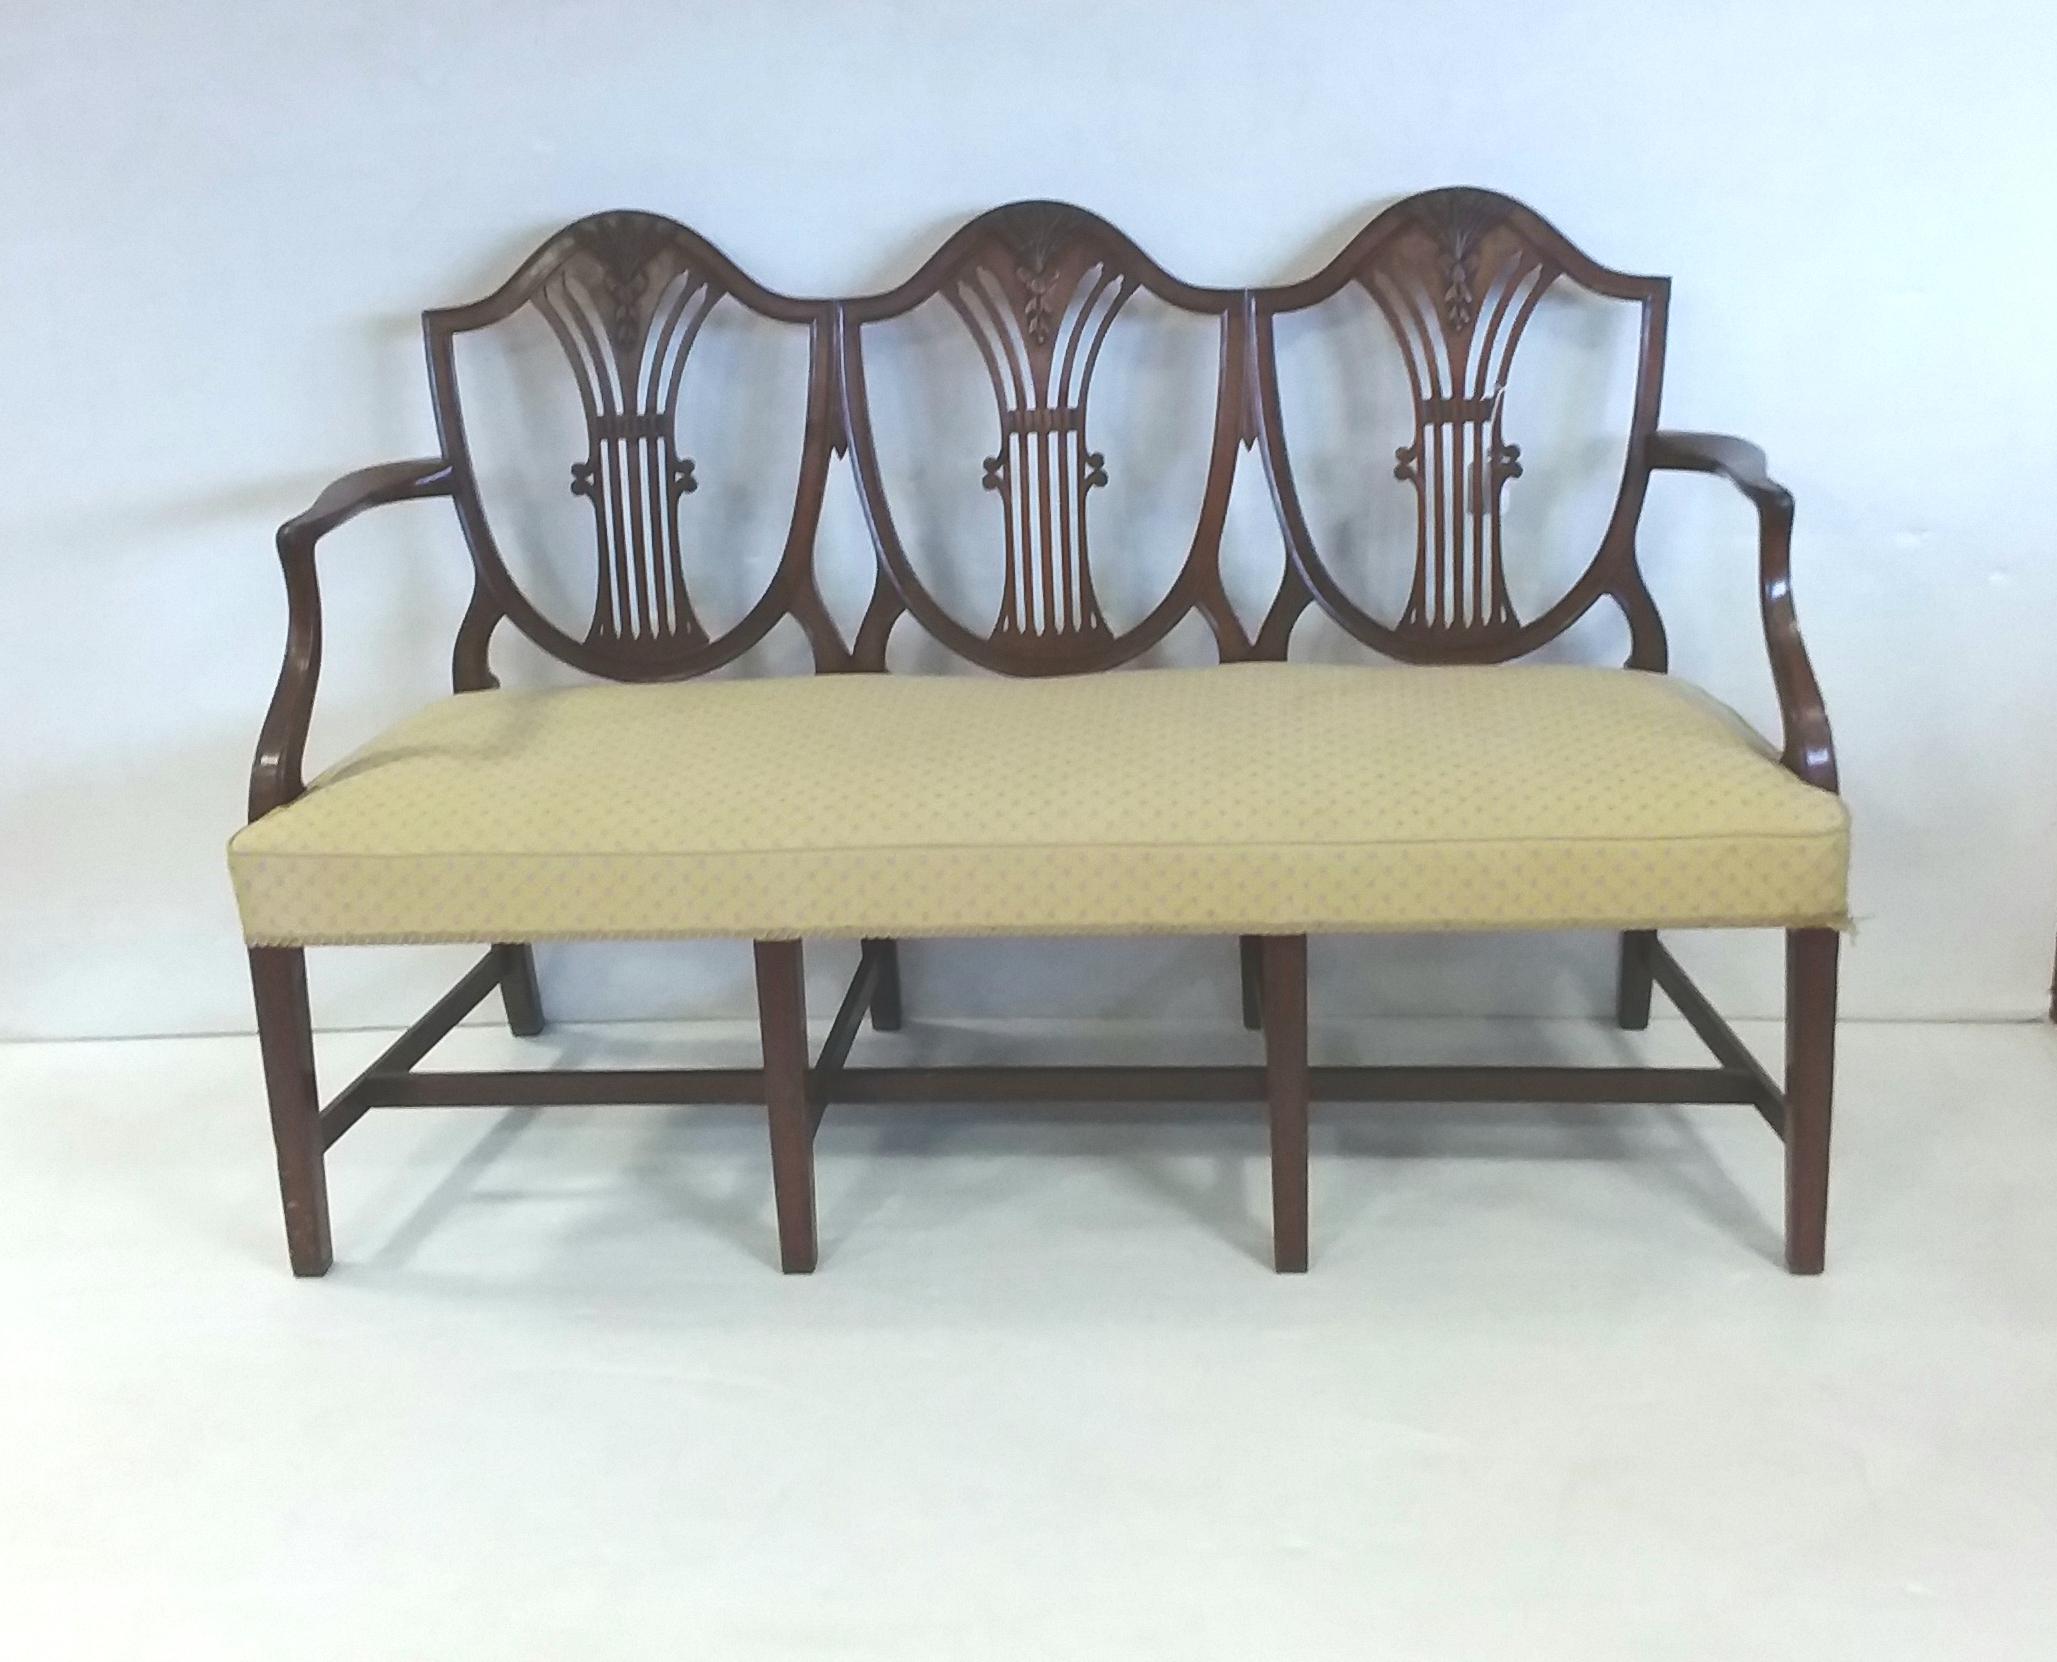 Antique Edwardian Bench